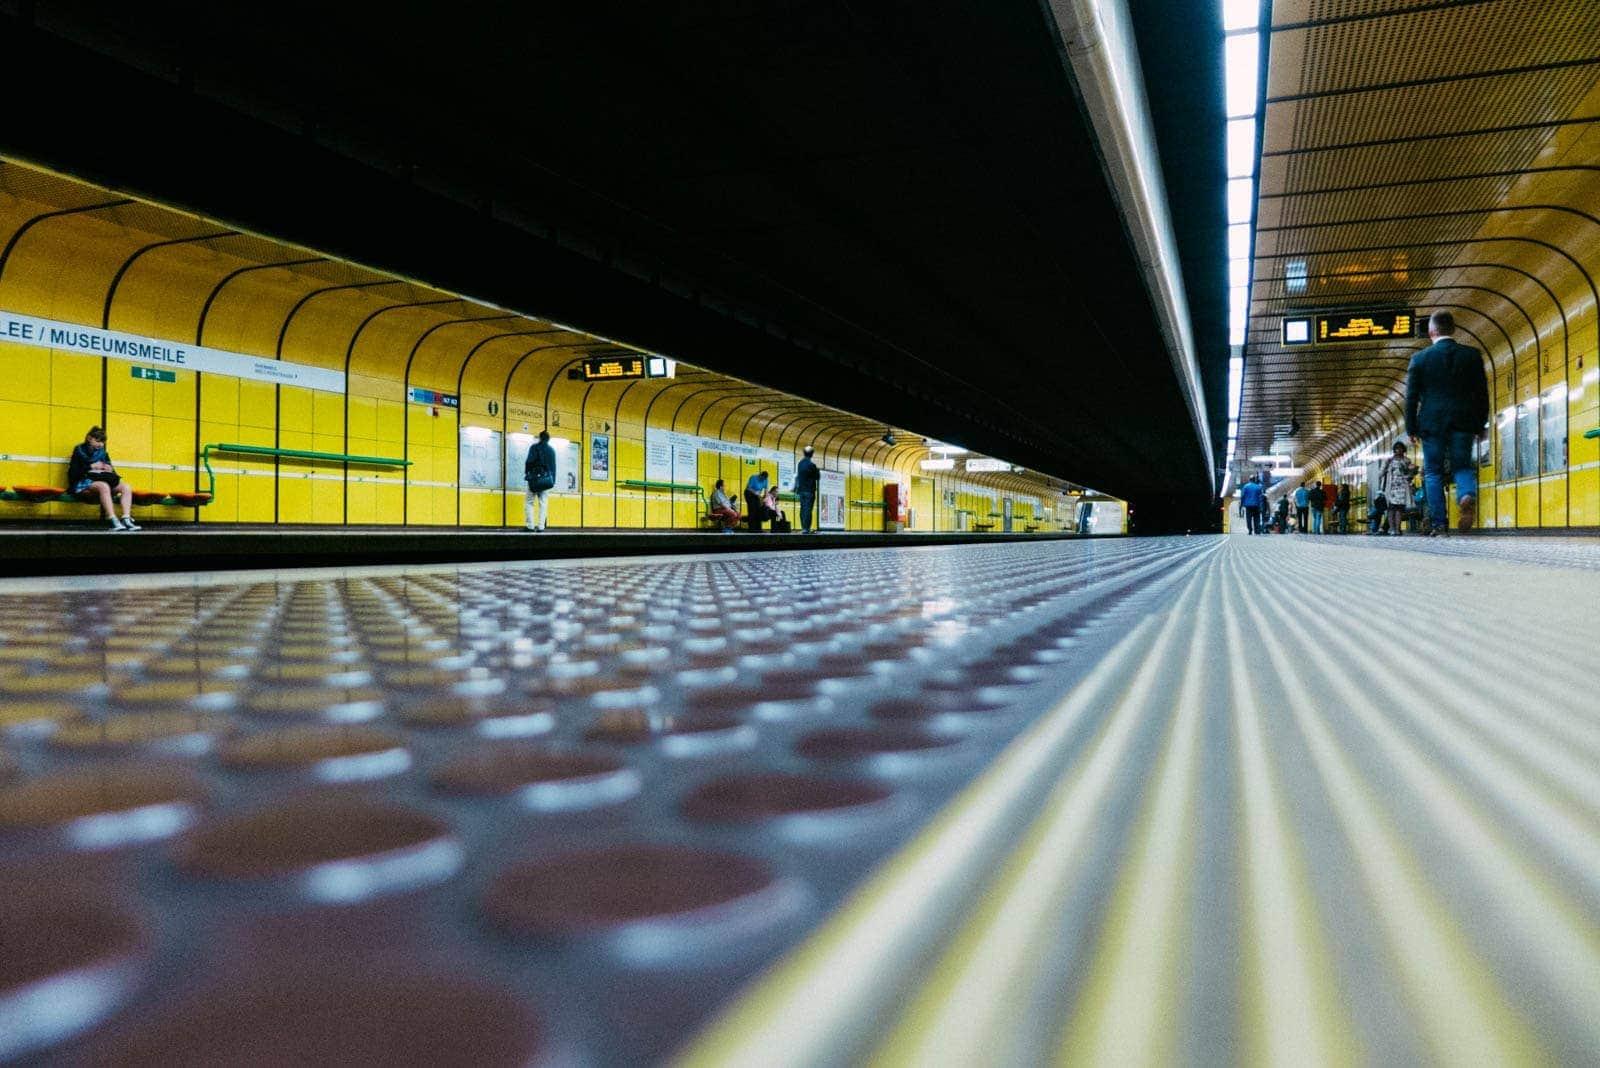 U-Bahn Haltestelle Bonn Heussallee Museumsmeile